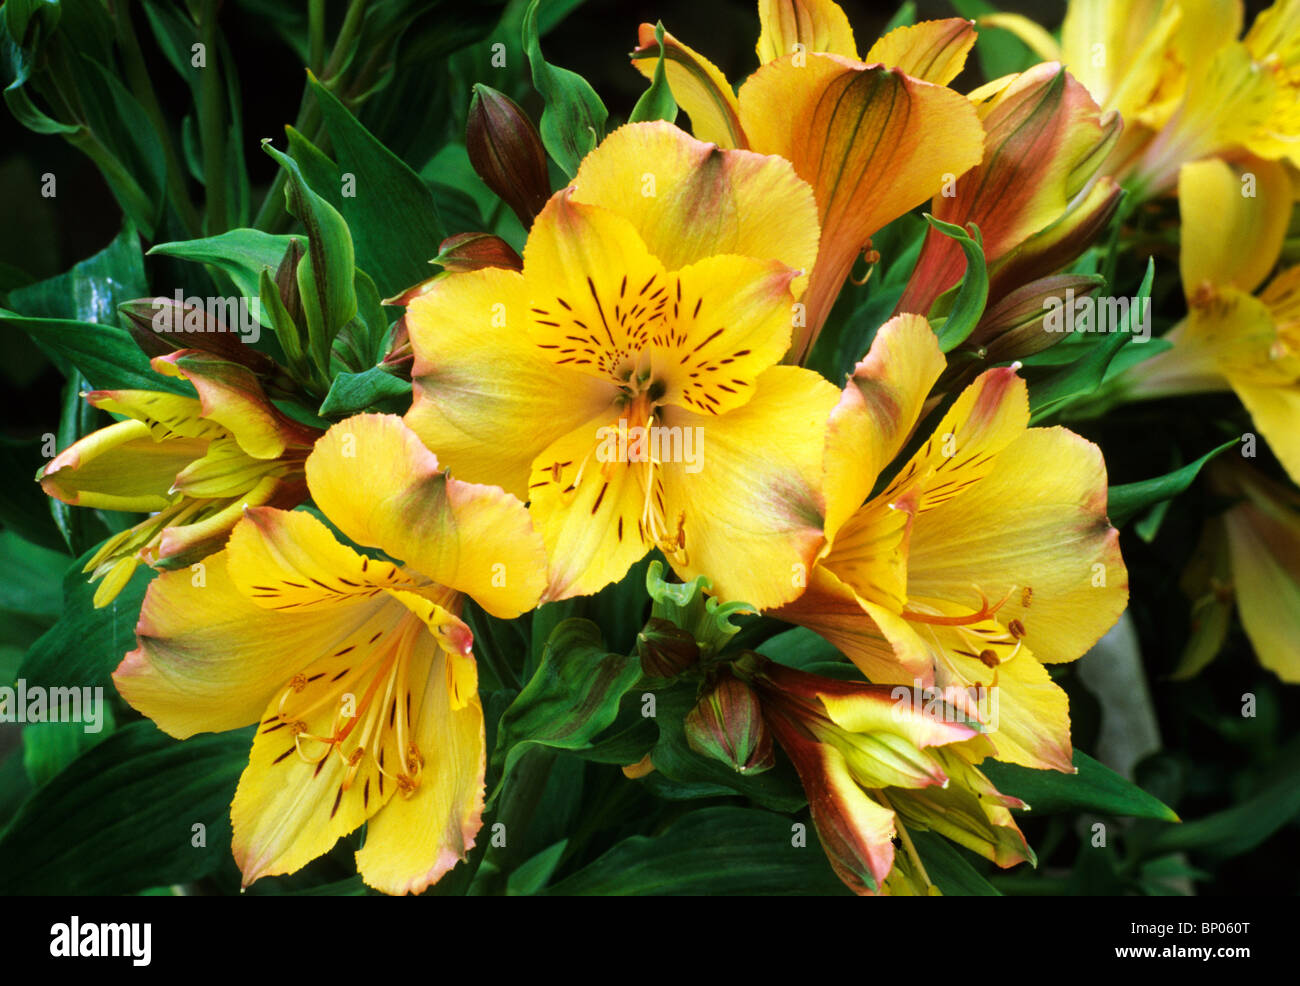 Alstroemeria Princess Lily Stock Photos Alstroemeria Princess Lily